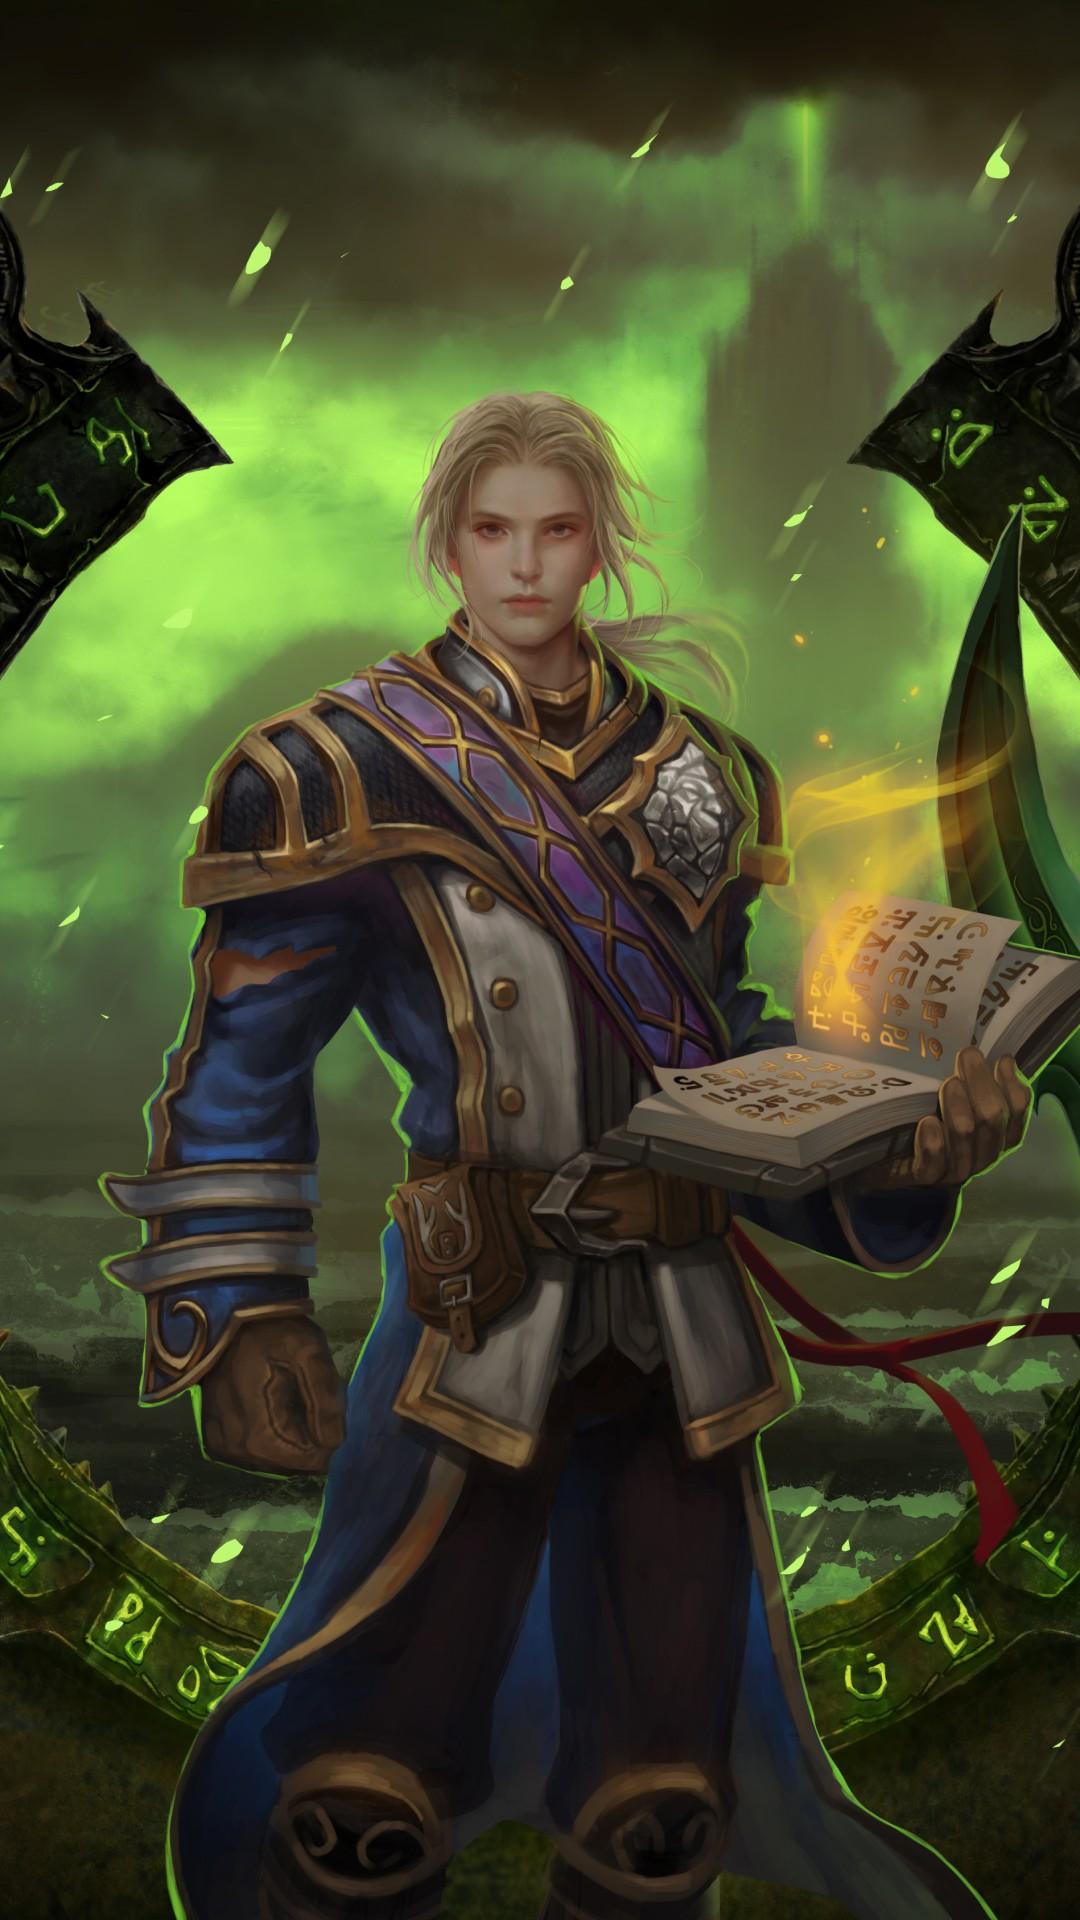 World of warcraft vr night elf - 4 4